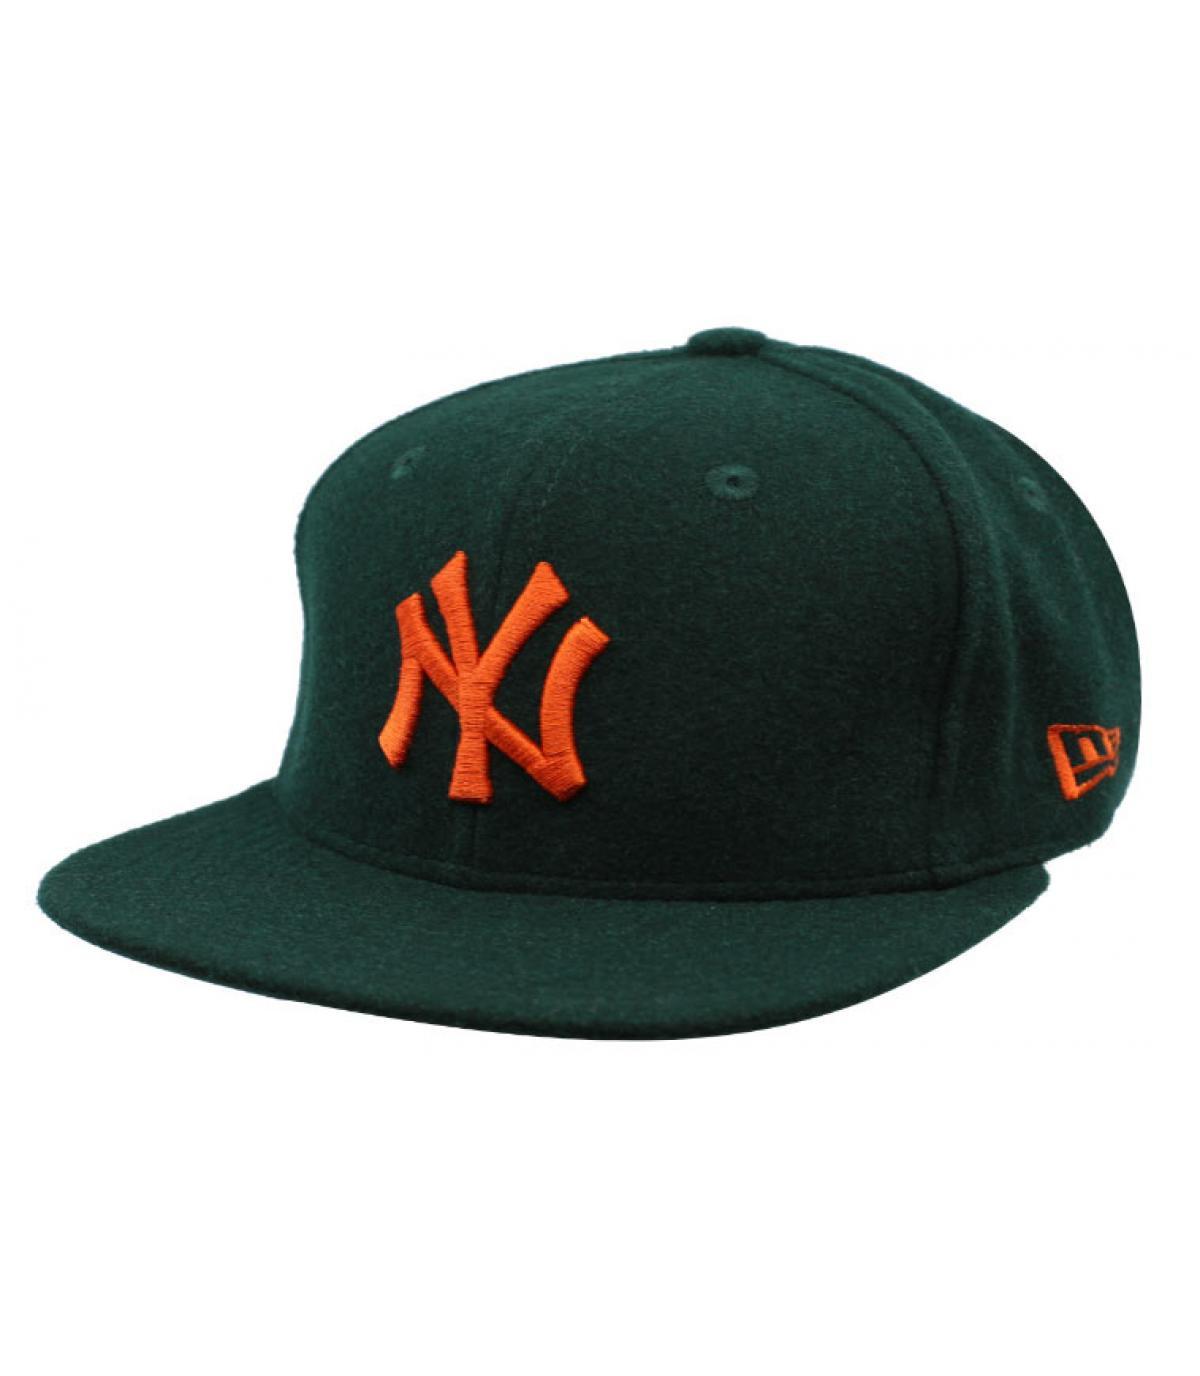 Details Winter Utility NY Melton 9Fifty dark green orange - afbeeling 2